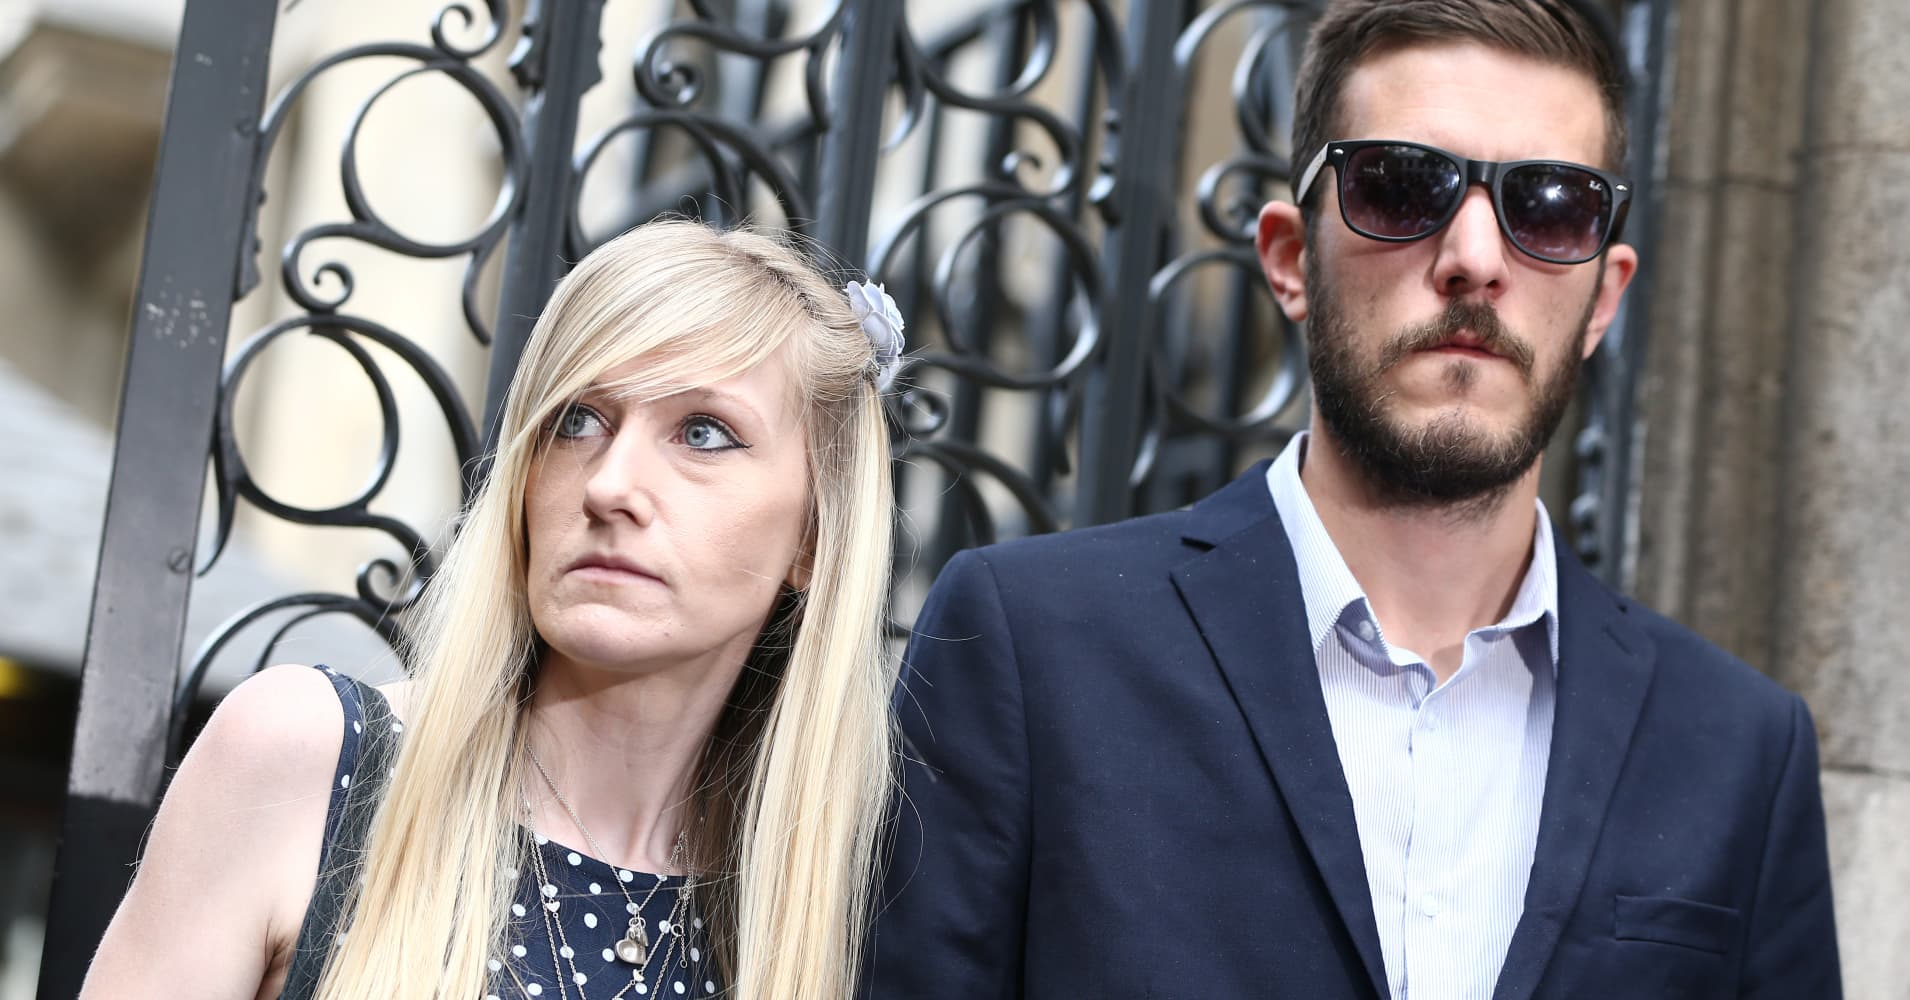 Parents of UK baby Charlie Gard end legal battle over treatment